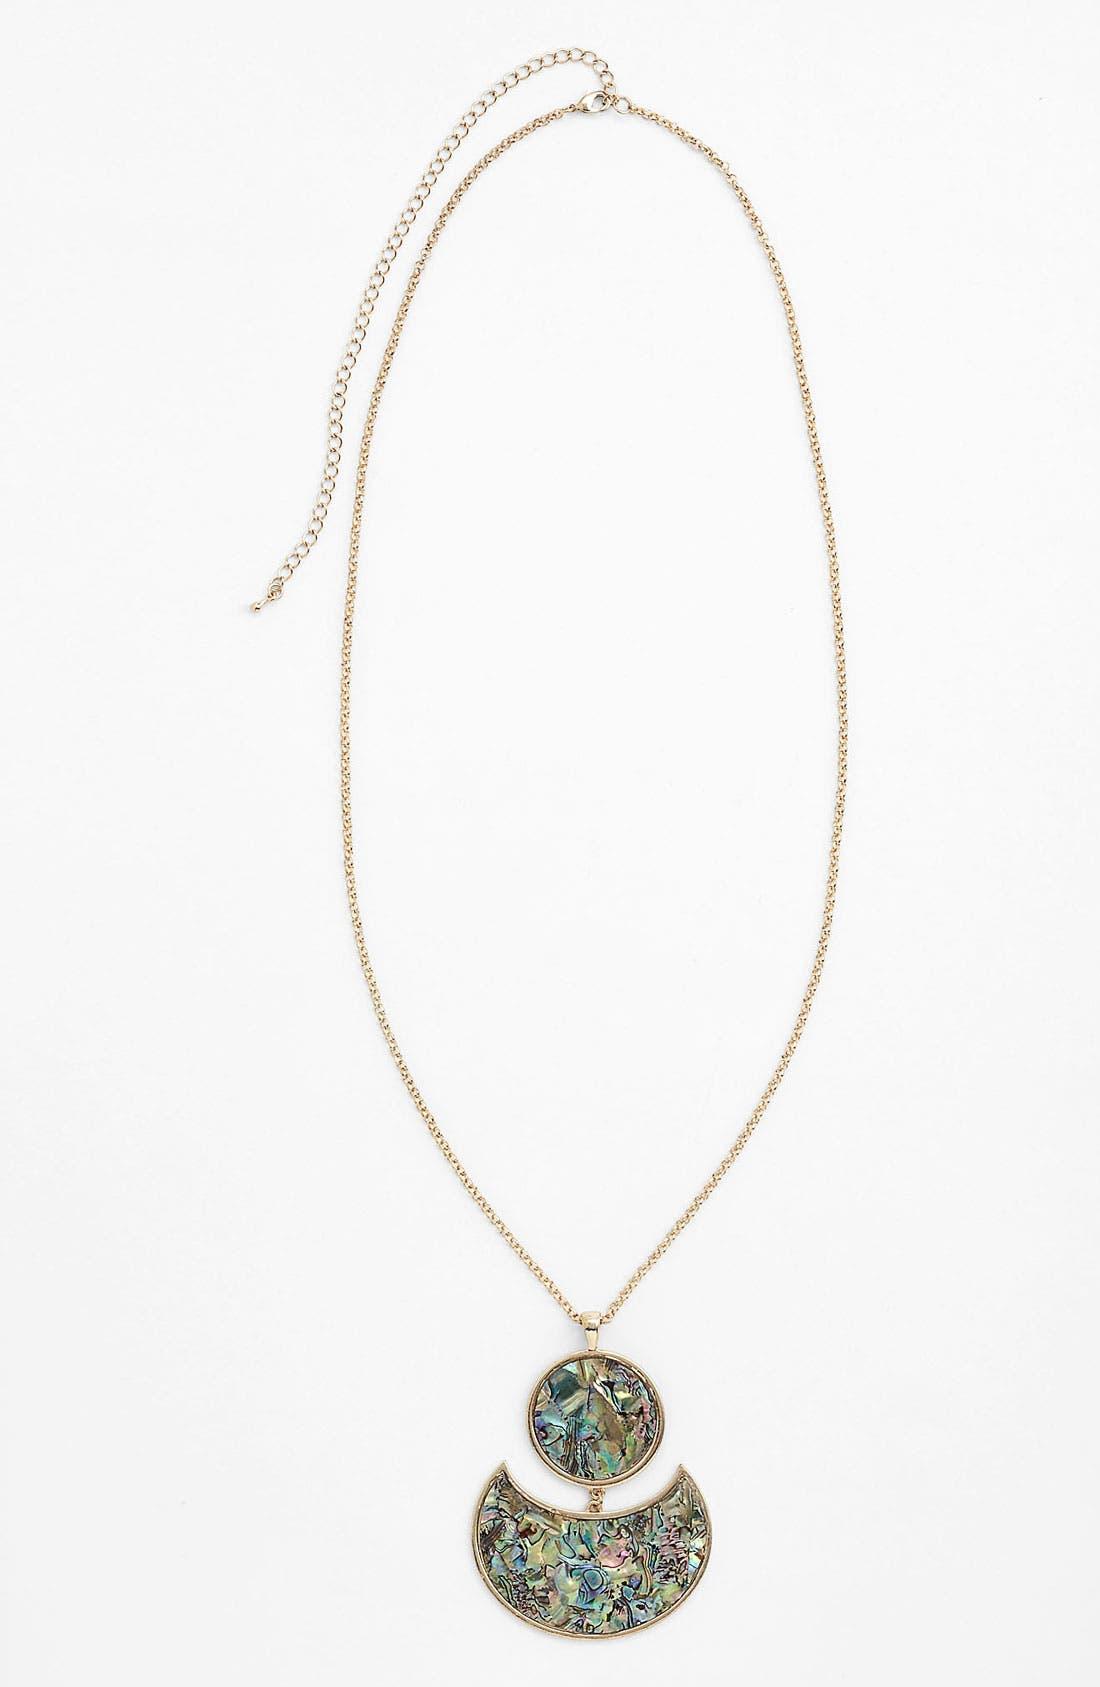 Main Image - Panacea 'Abalone Circle Crescent' Pendant Necklace